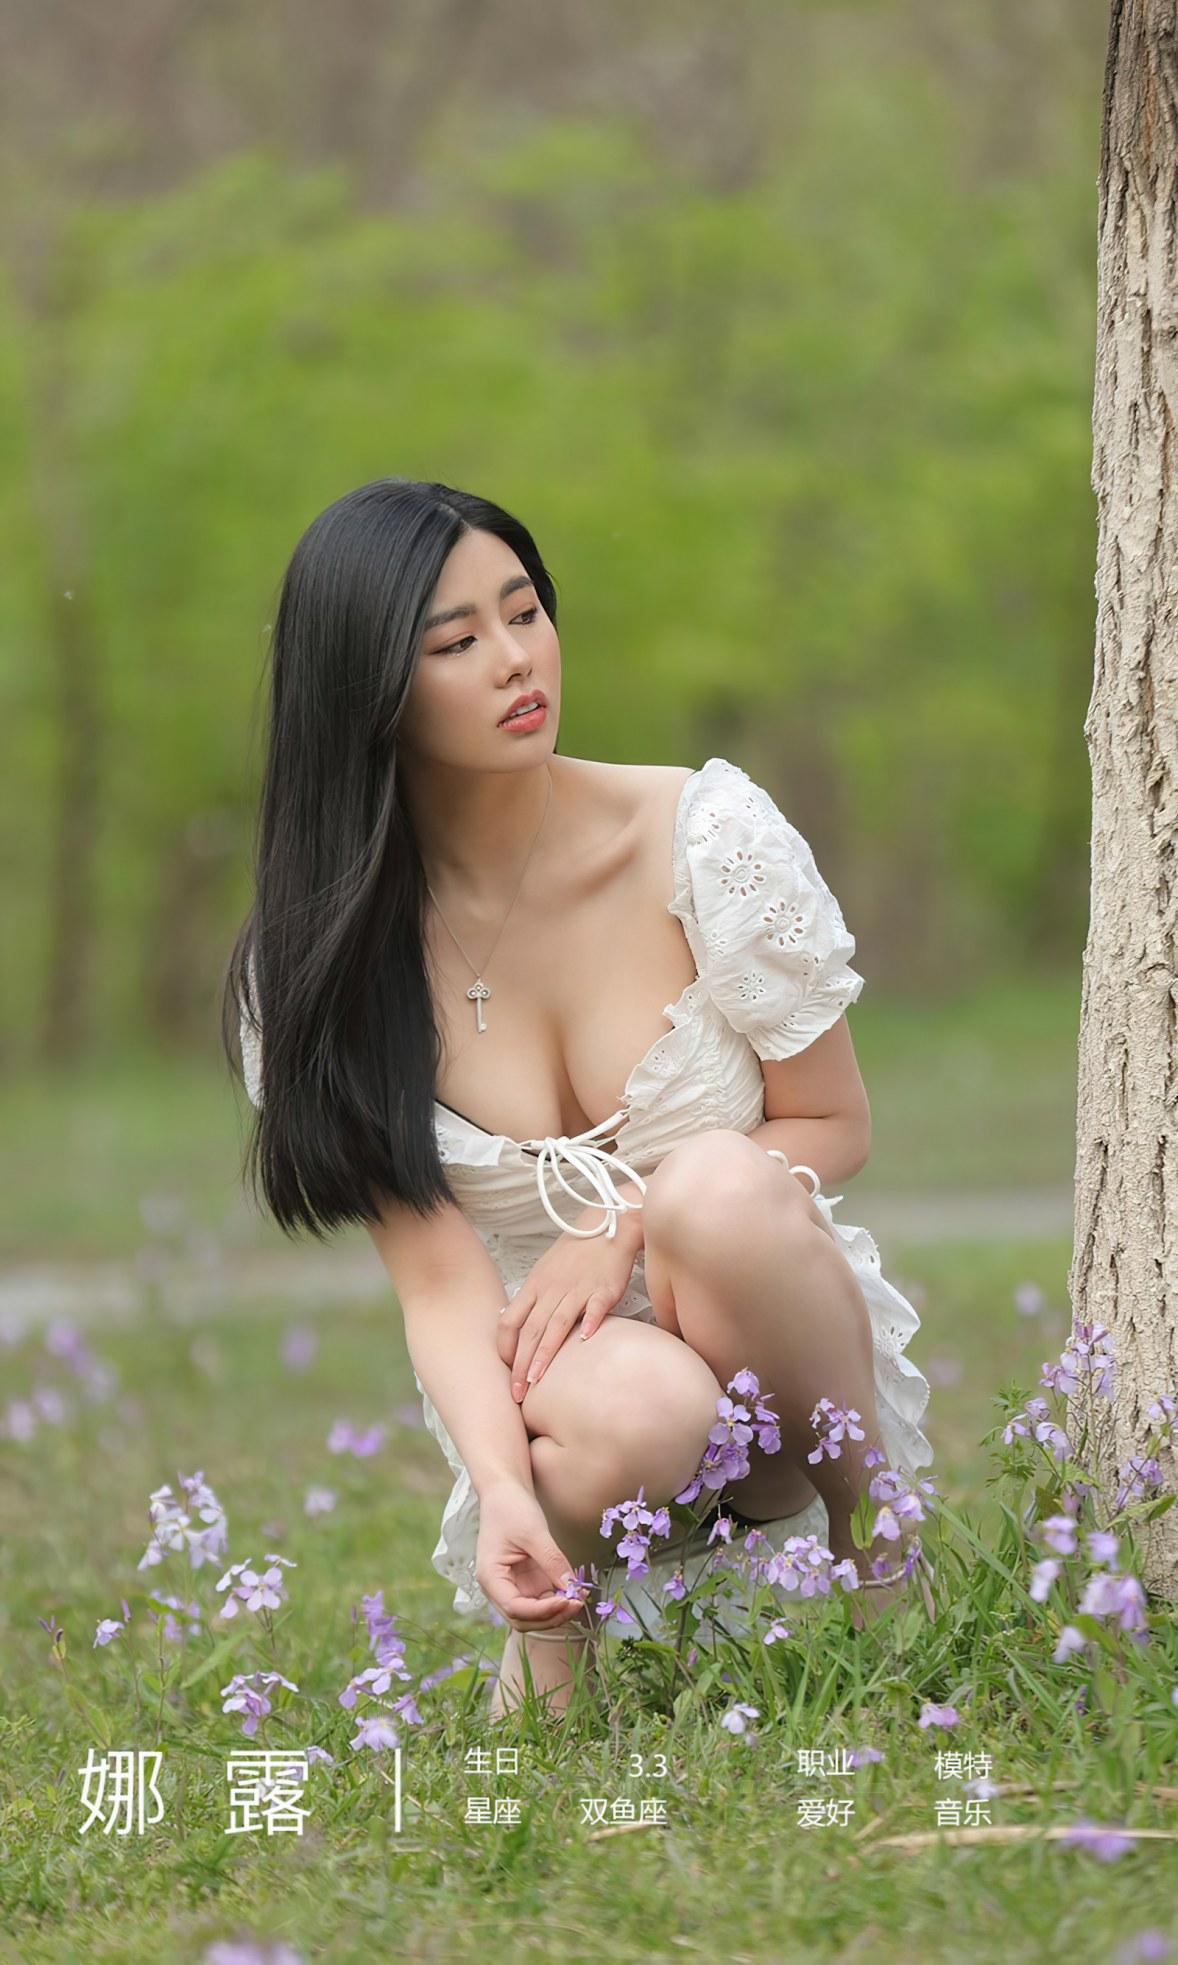 UGirls 爱尤物 No.2098 露天诱惑 娜露 翘臀巨乳 - 4